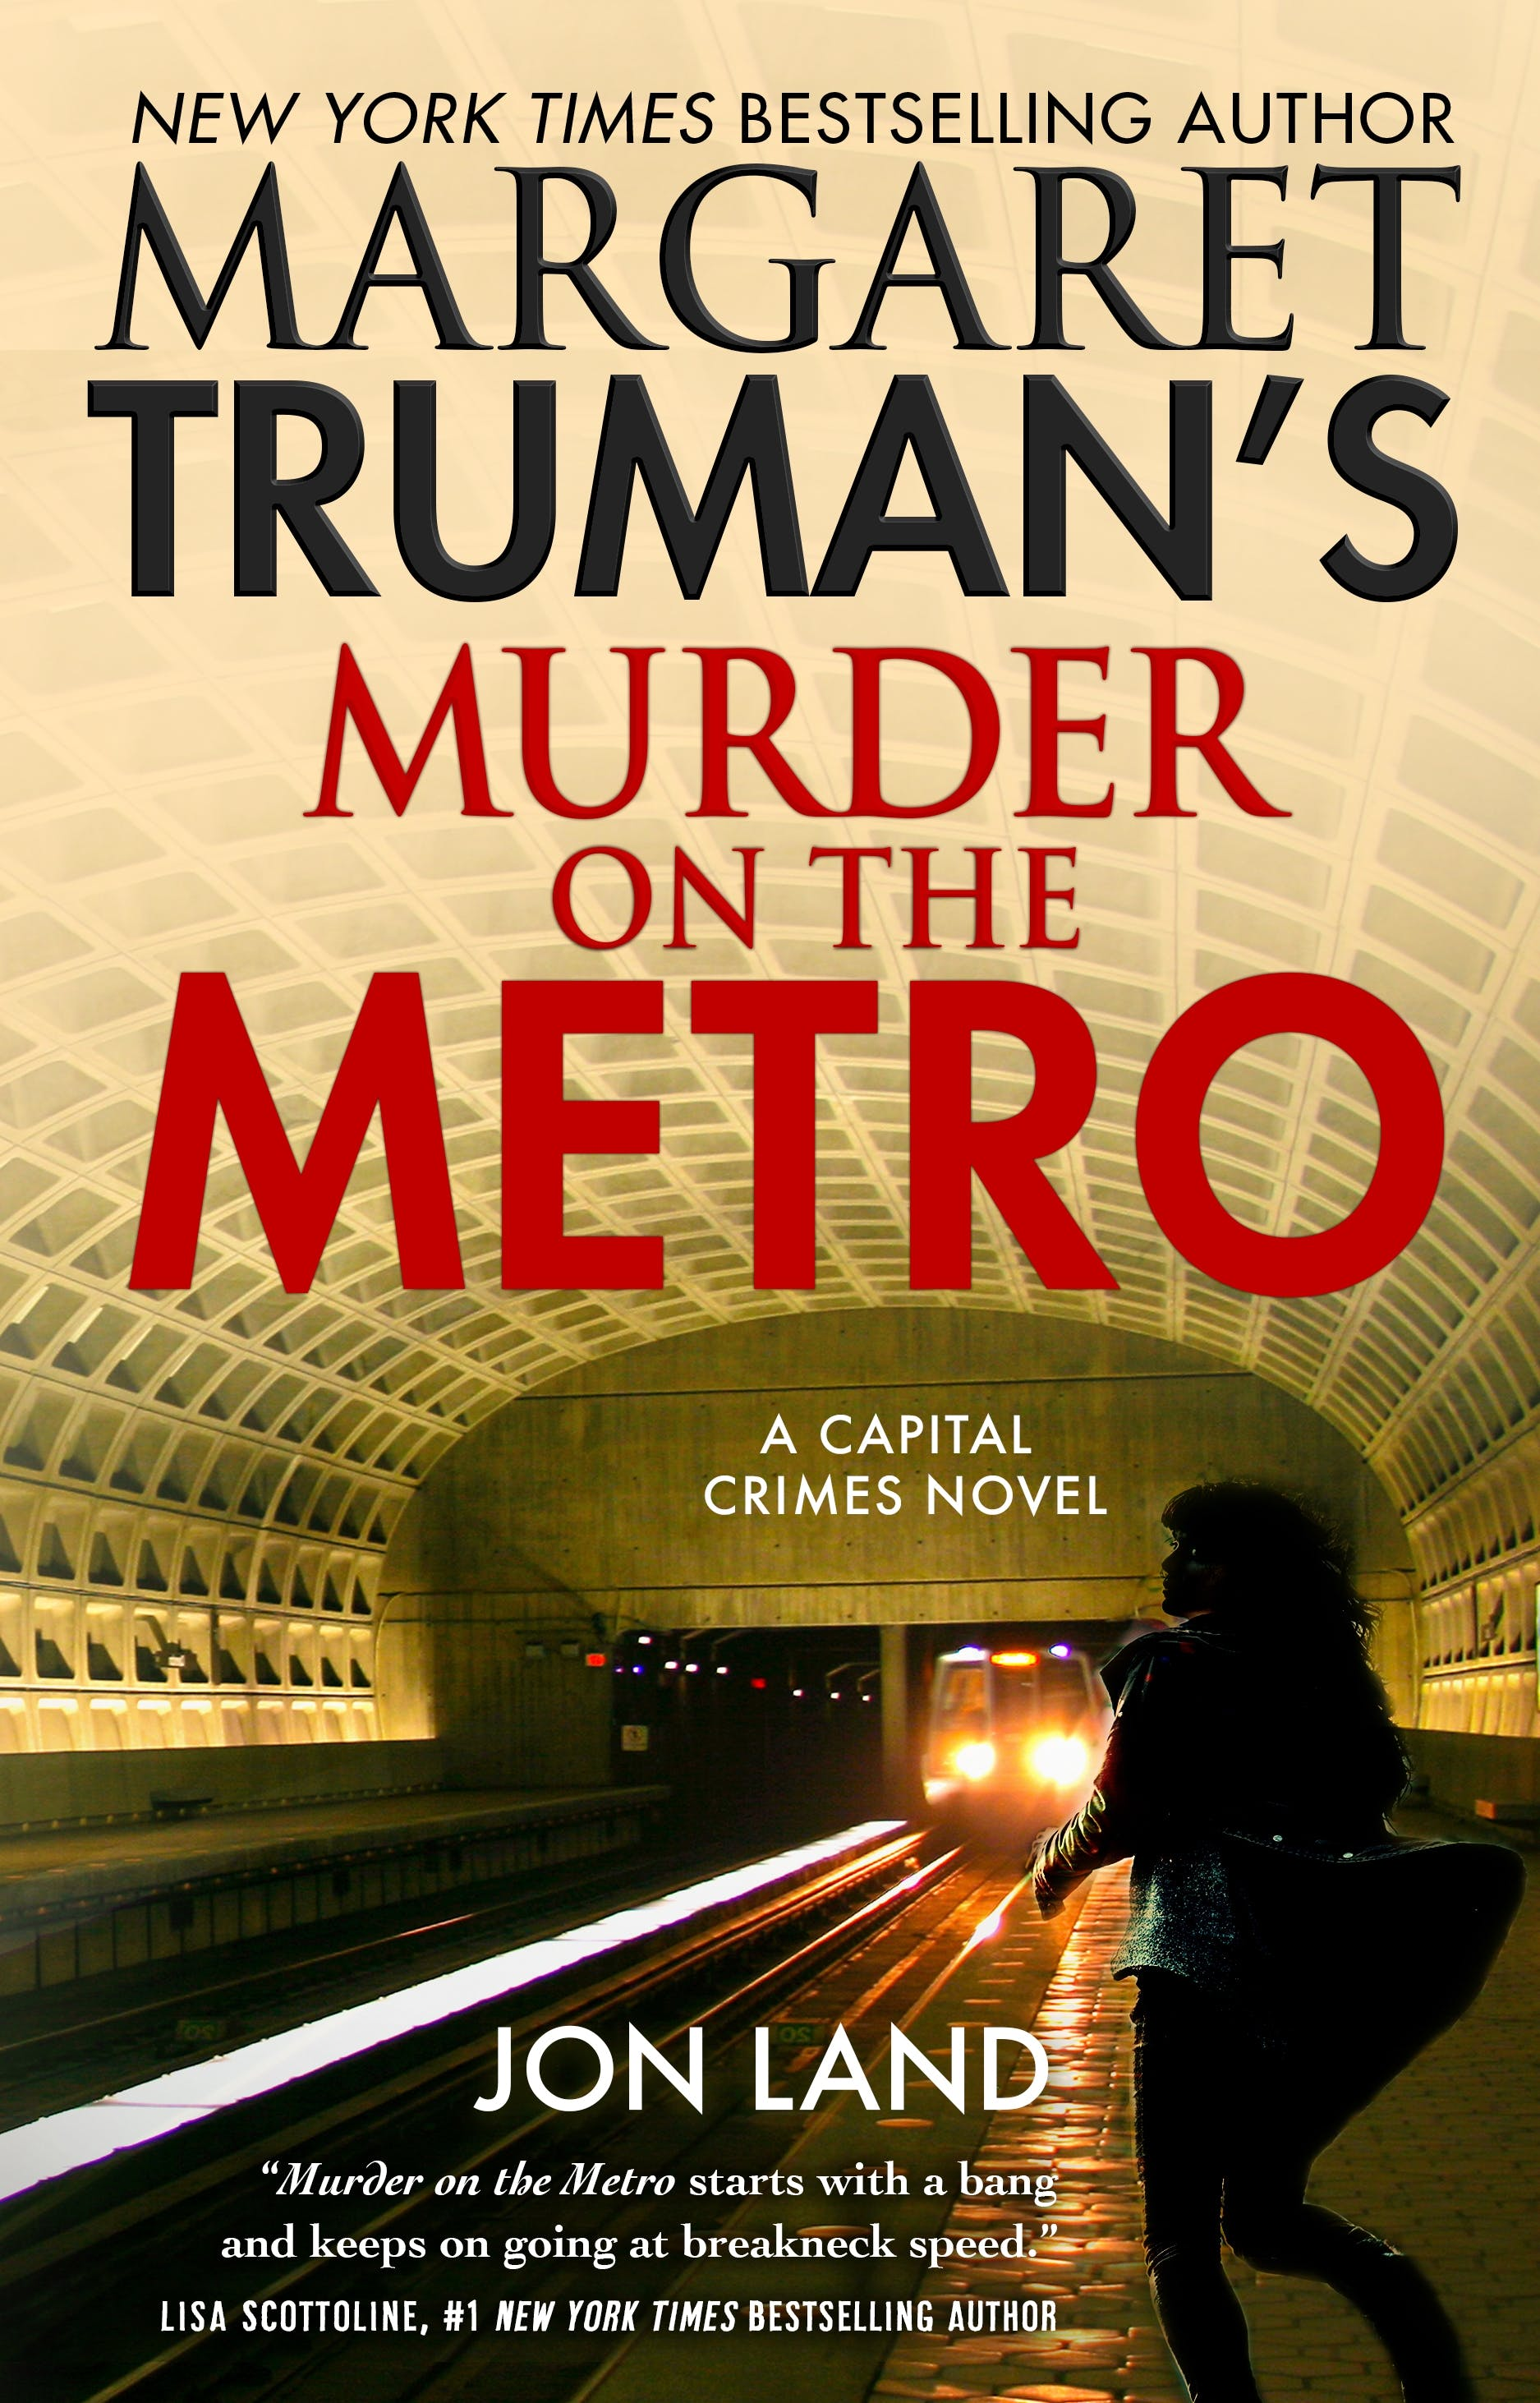 Image of Margaret Truman's Murder on the Metro